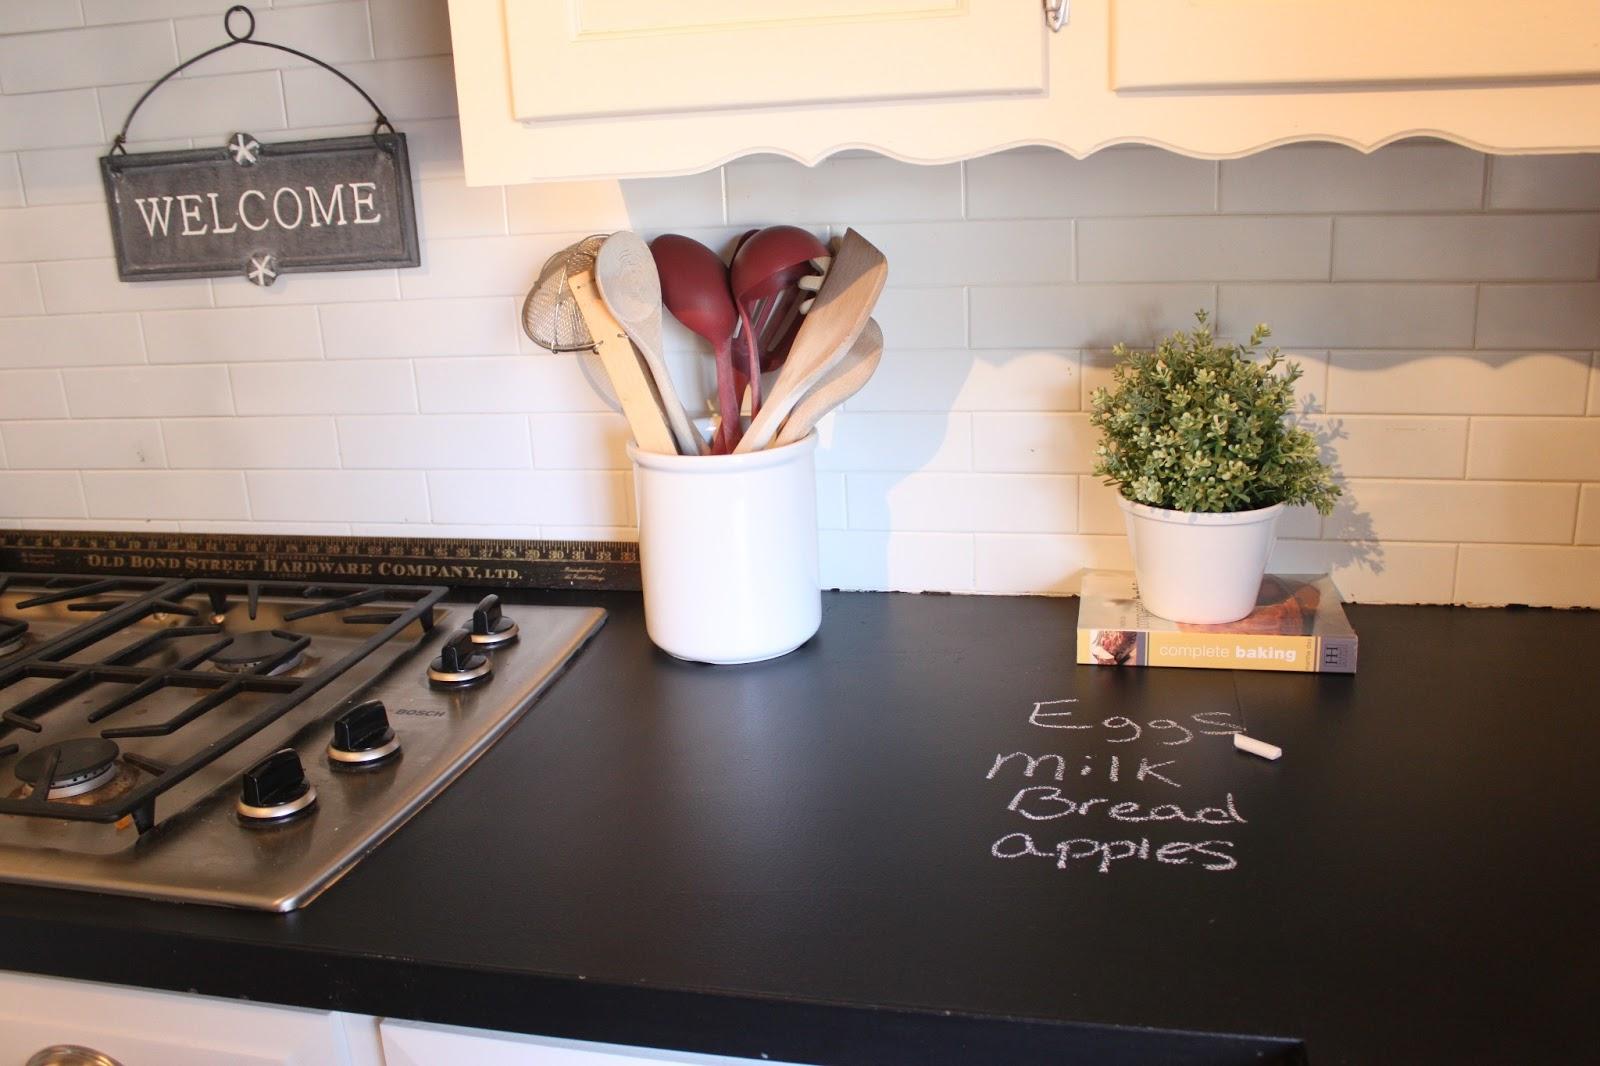 DIY chalkboard countertops